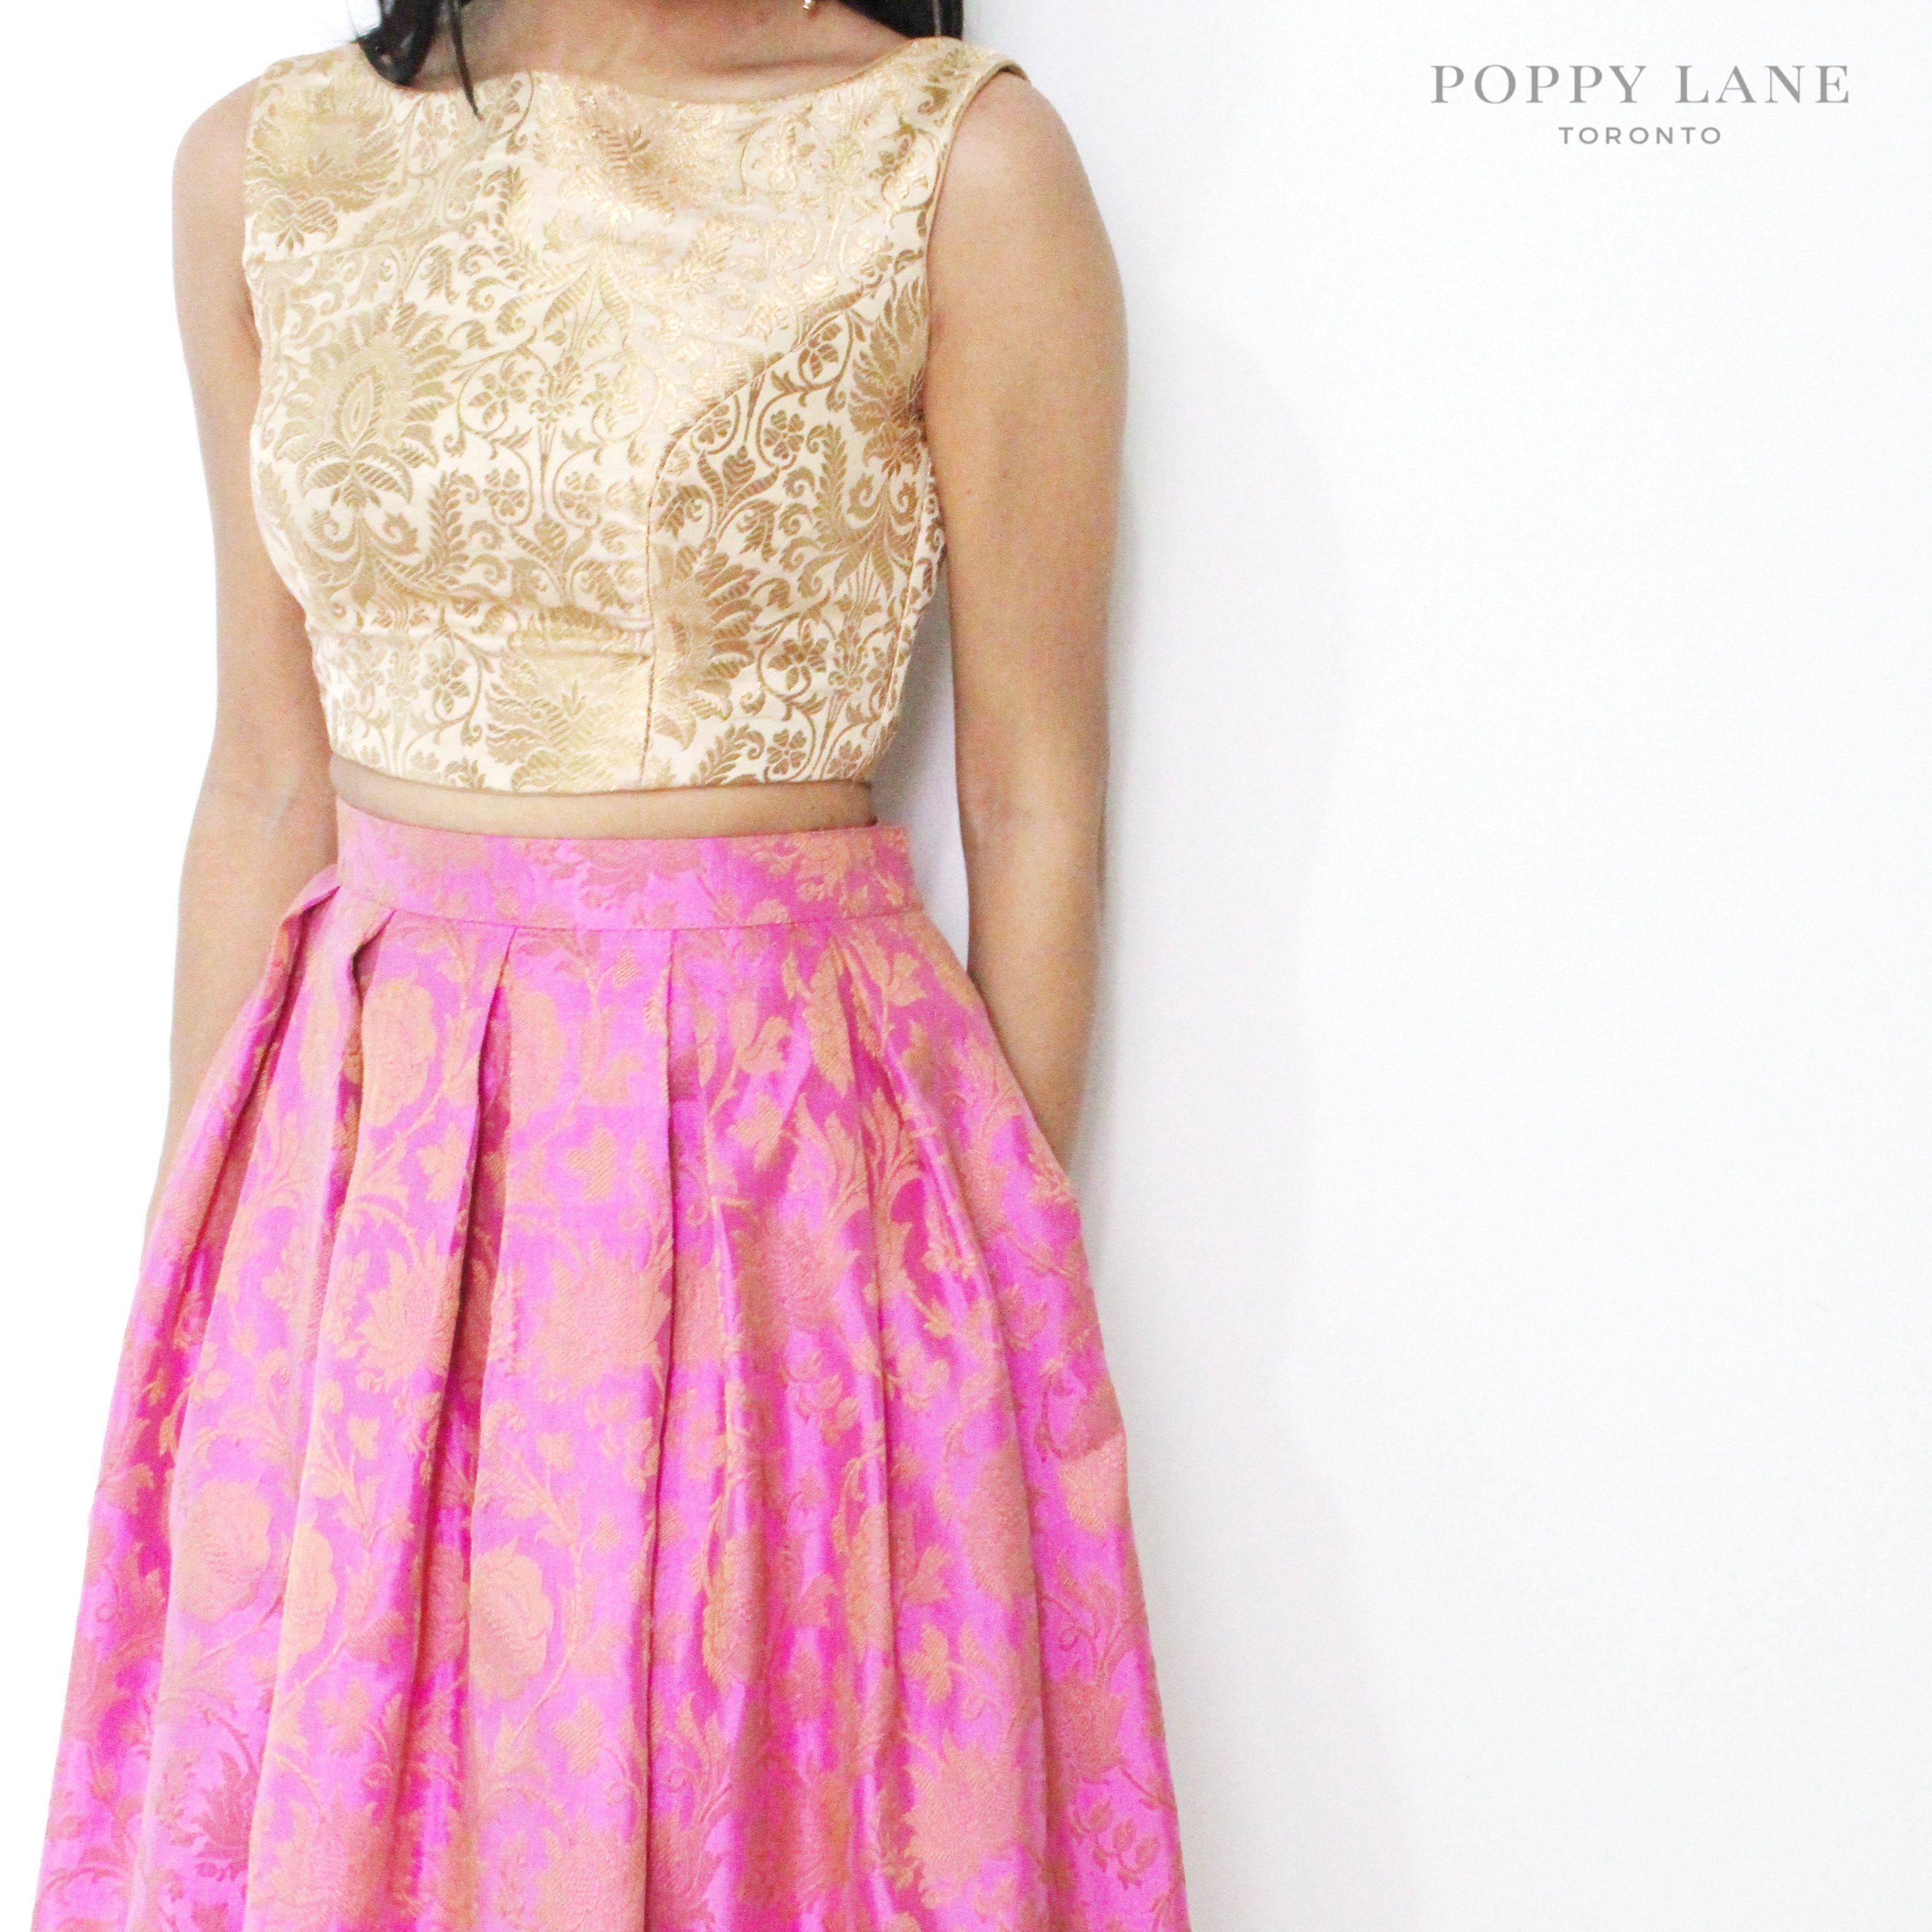 Pin de Aberamy Sundar en my fashion stuffs | Pinterest